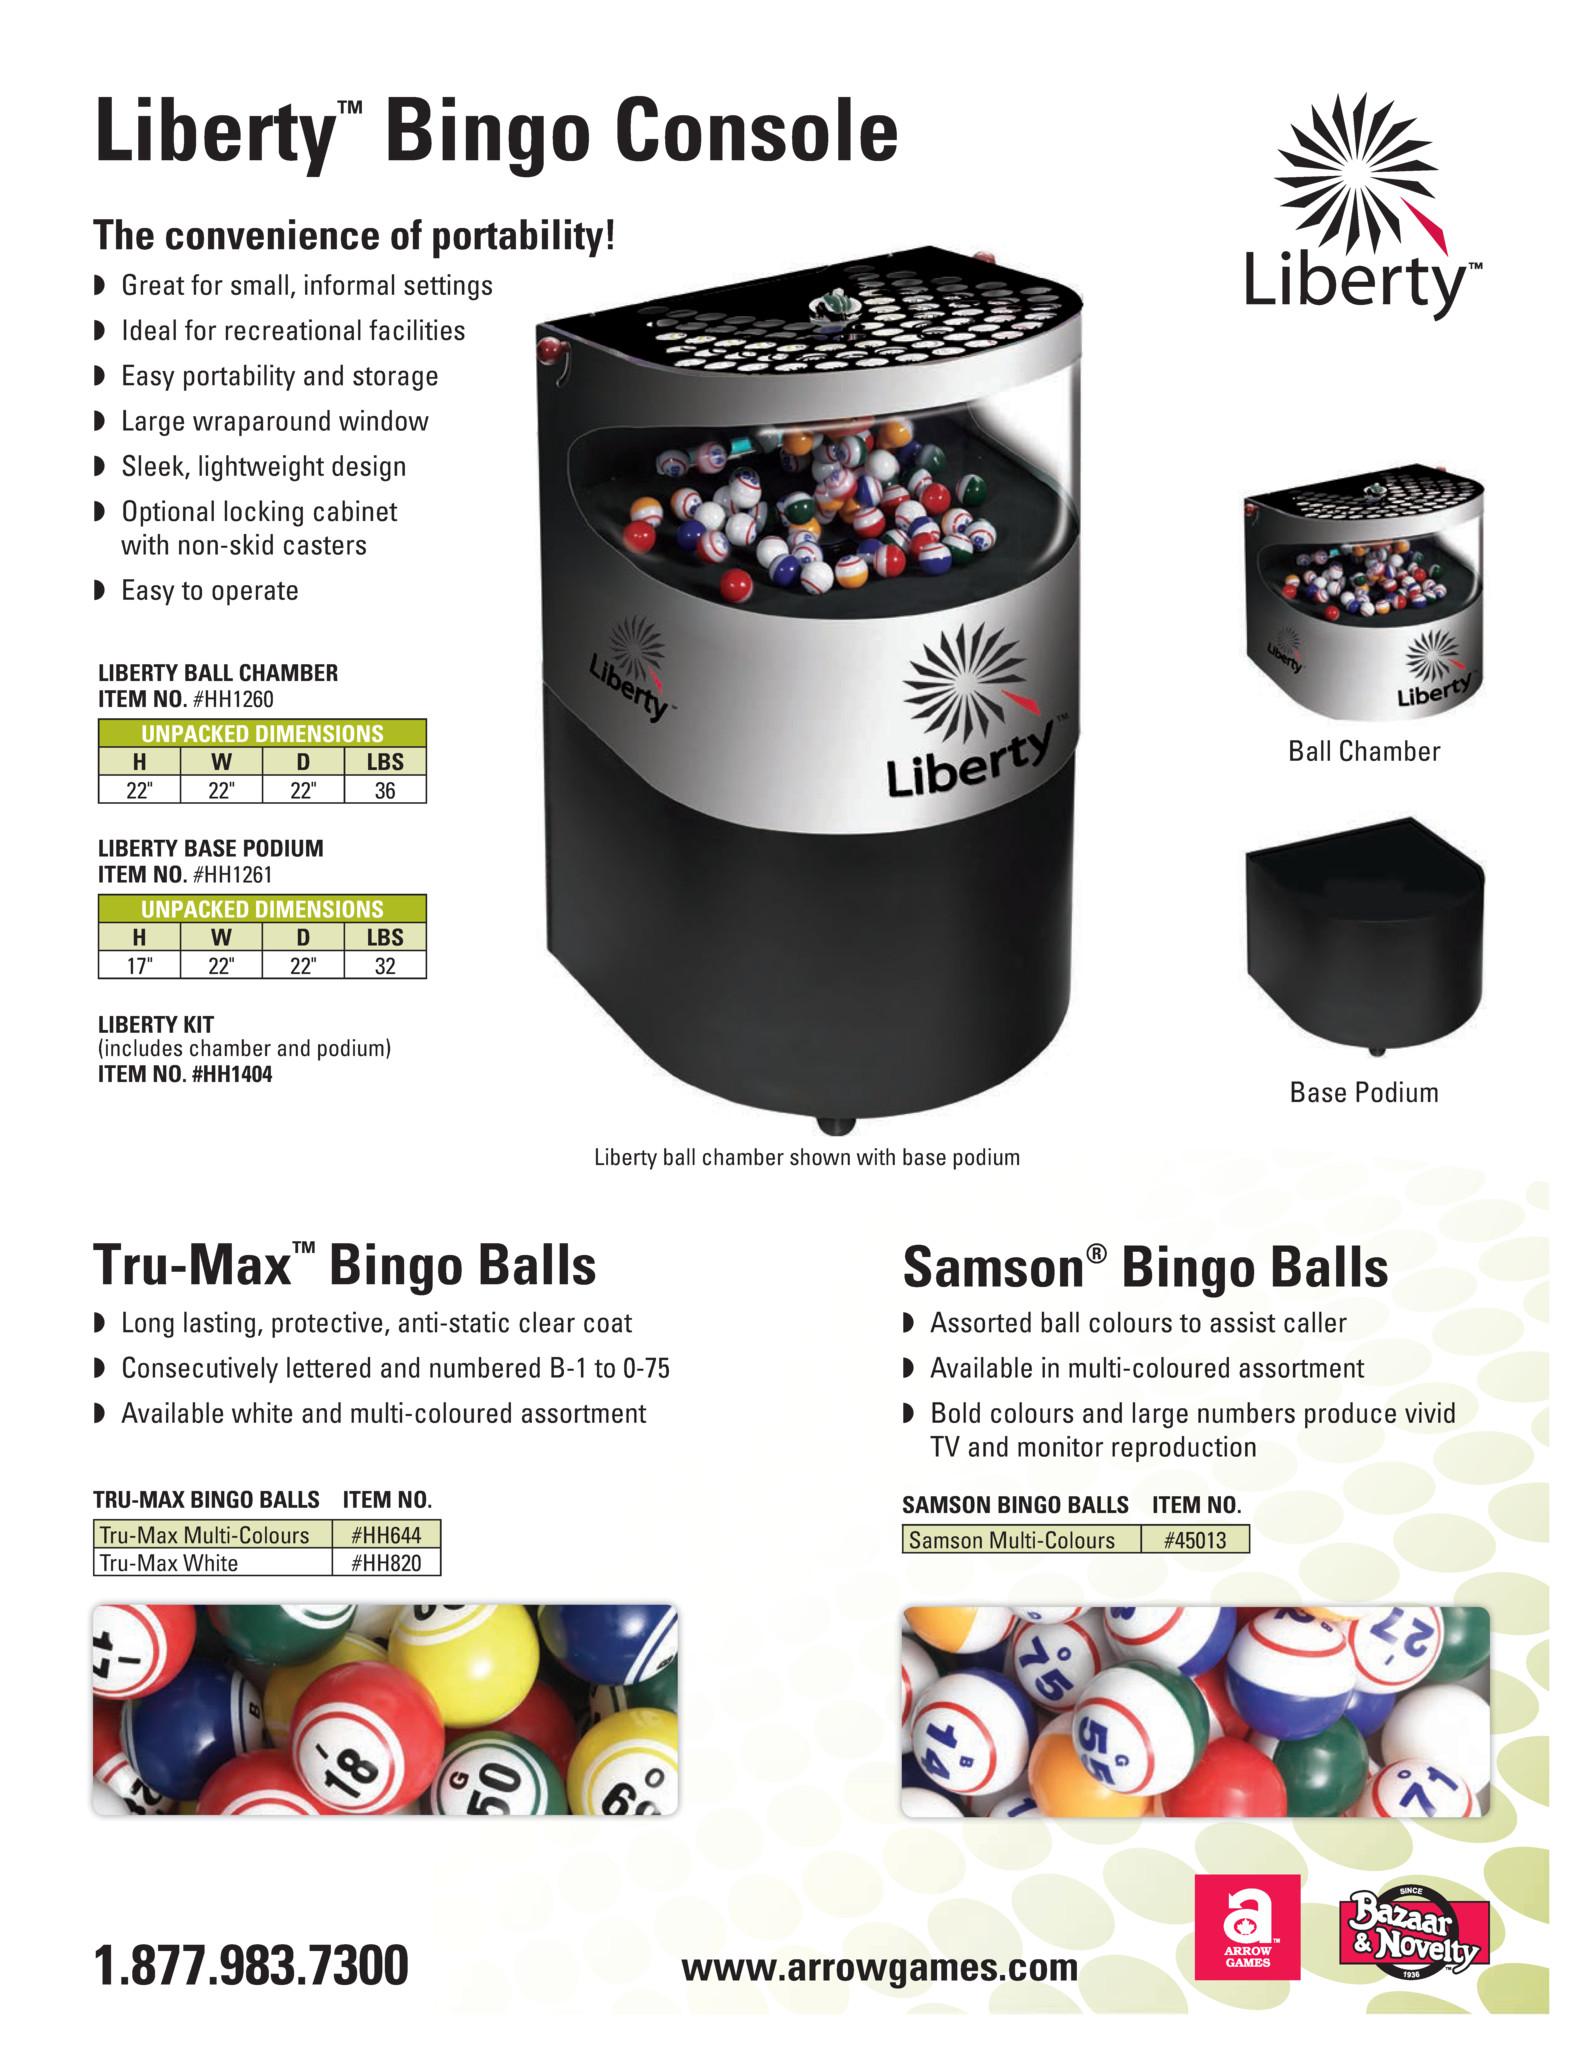 Liberty Bingo Console Flyer Promotional Materials/Equipment Flyers & Brochures